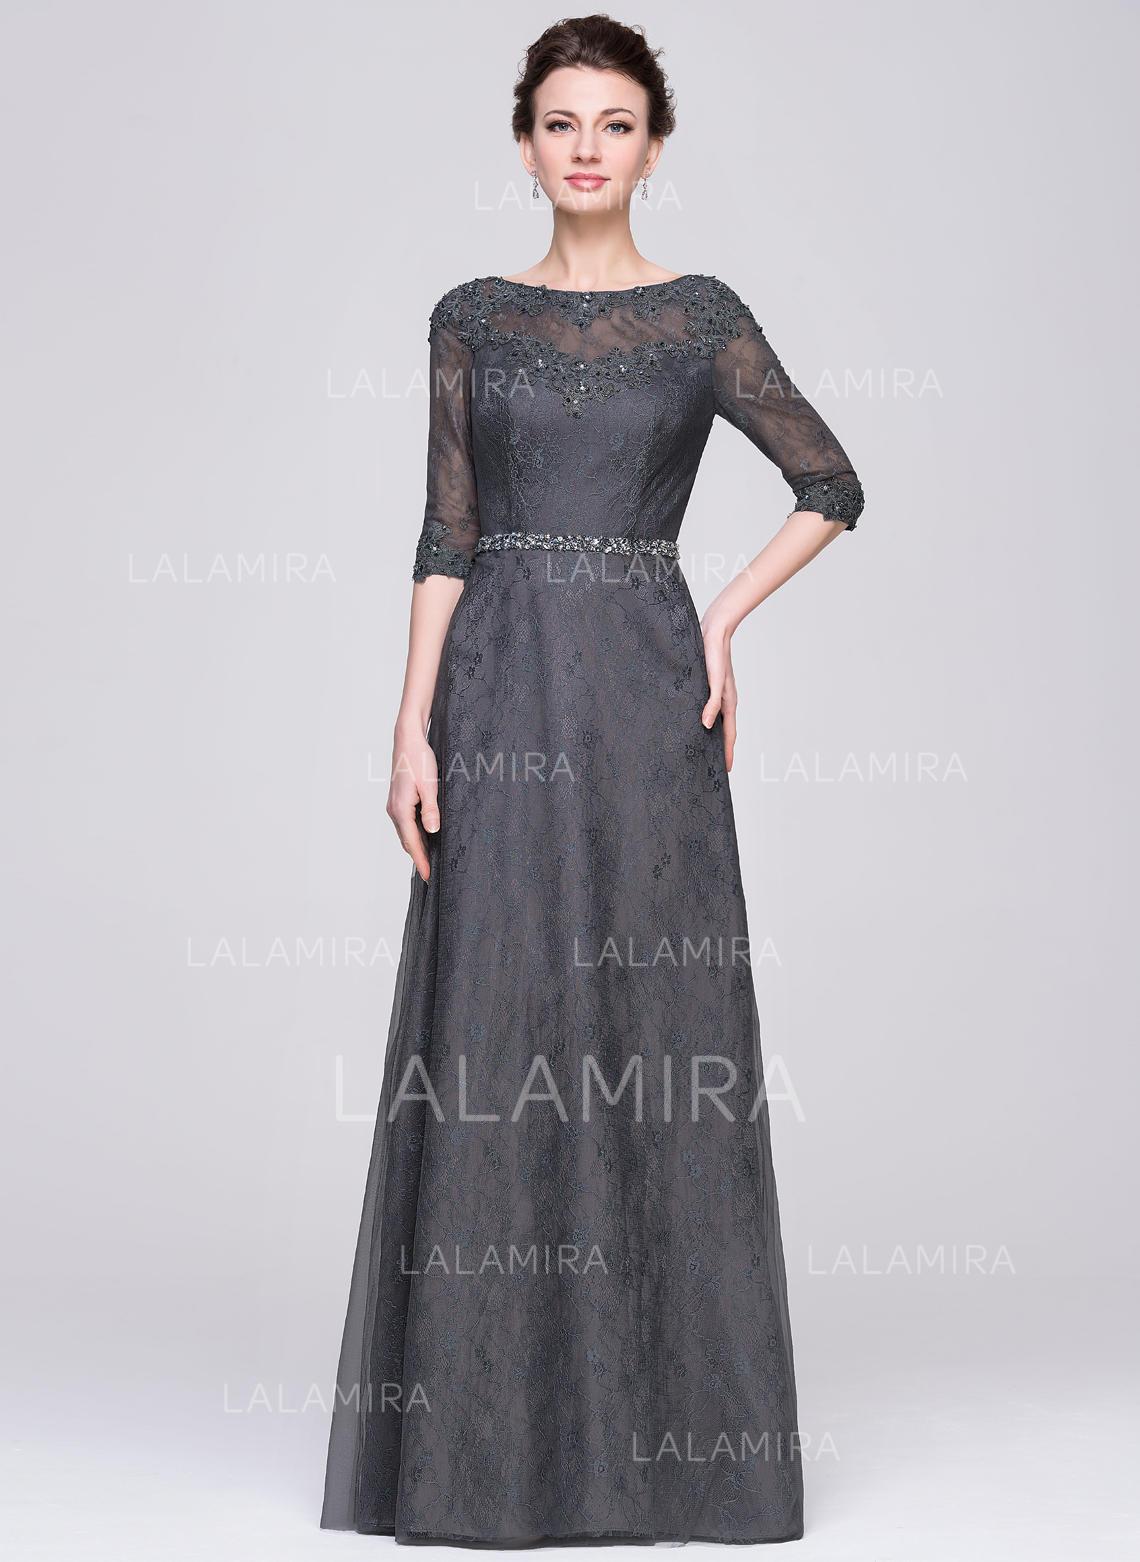 bfc7e3b0 A-formet/Prinsesse Scoop Hals Tyll Blonder Moderne Kjoler til Brudens Mor  (008211522. Loading zoom